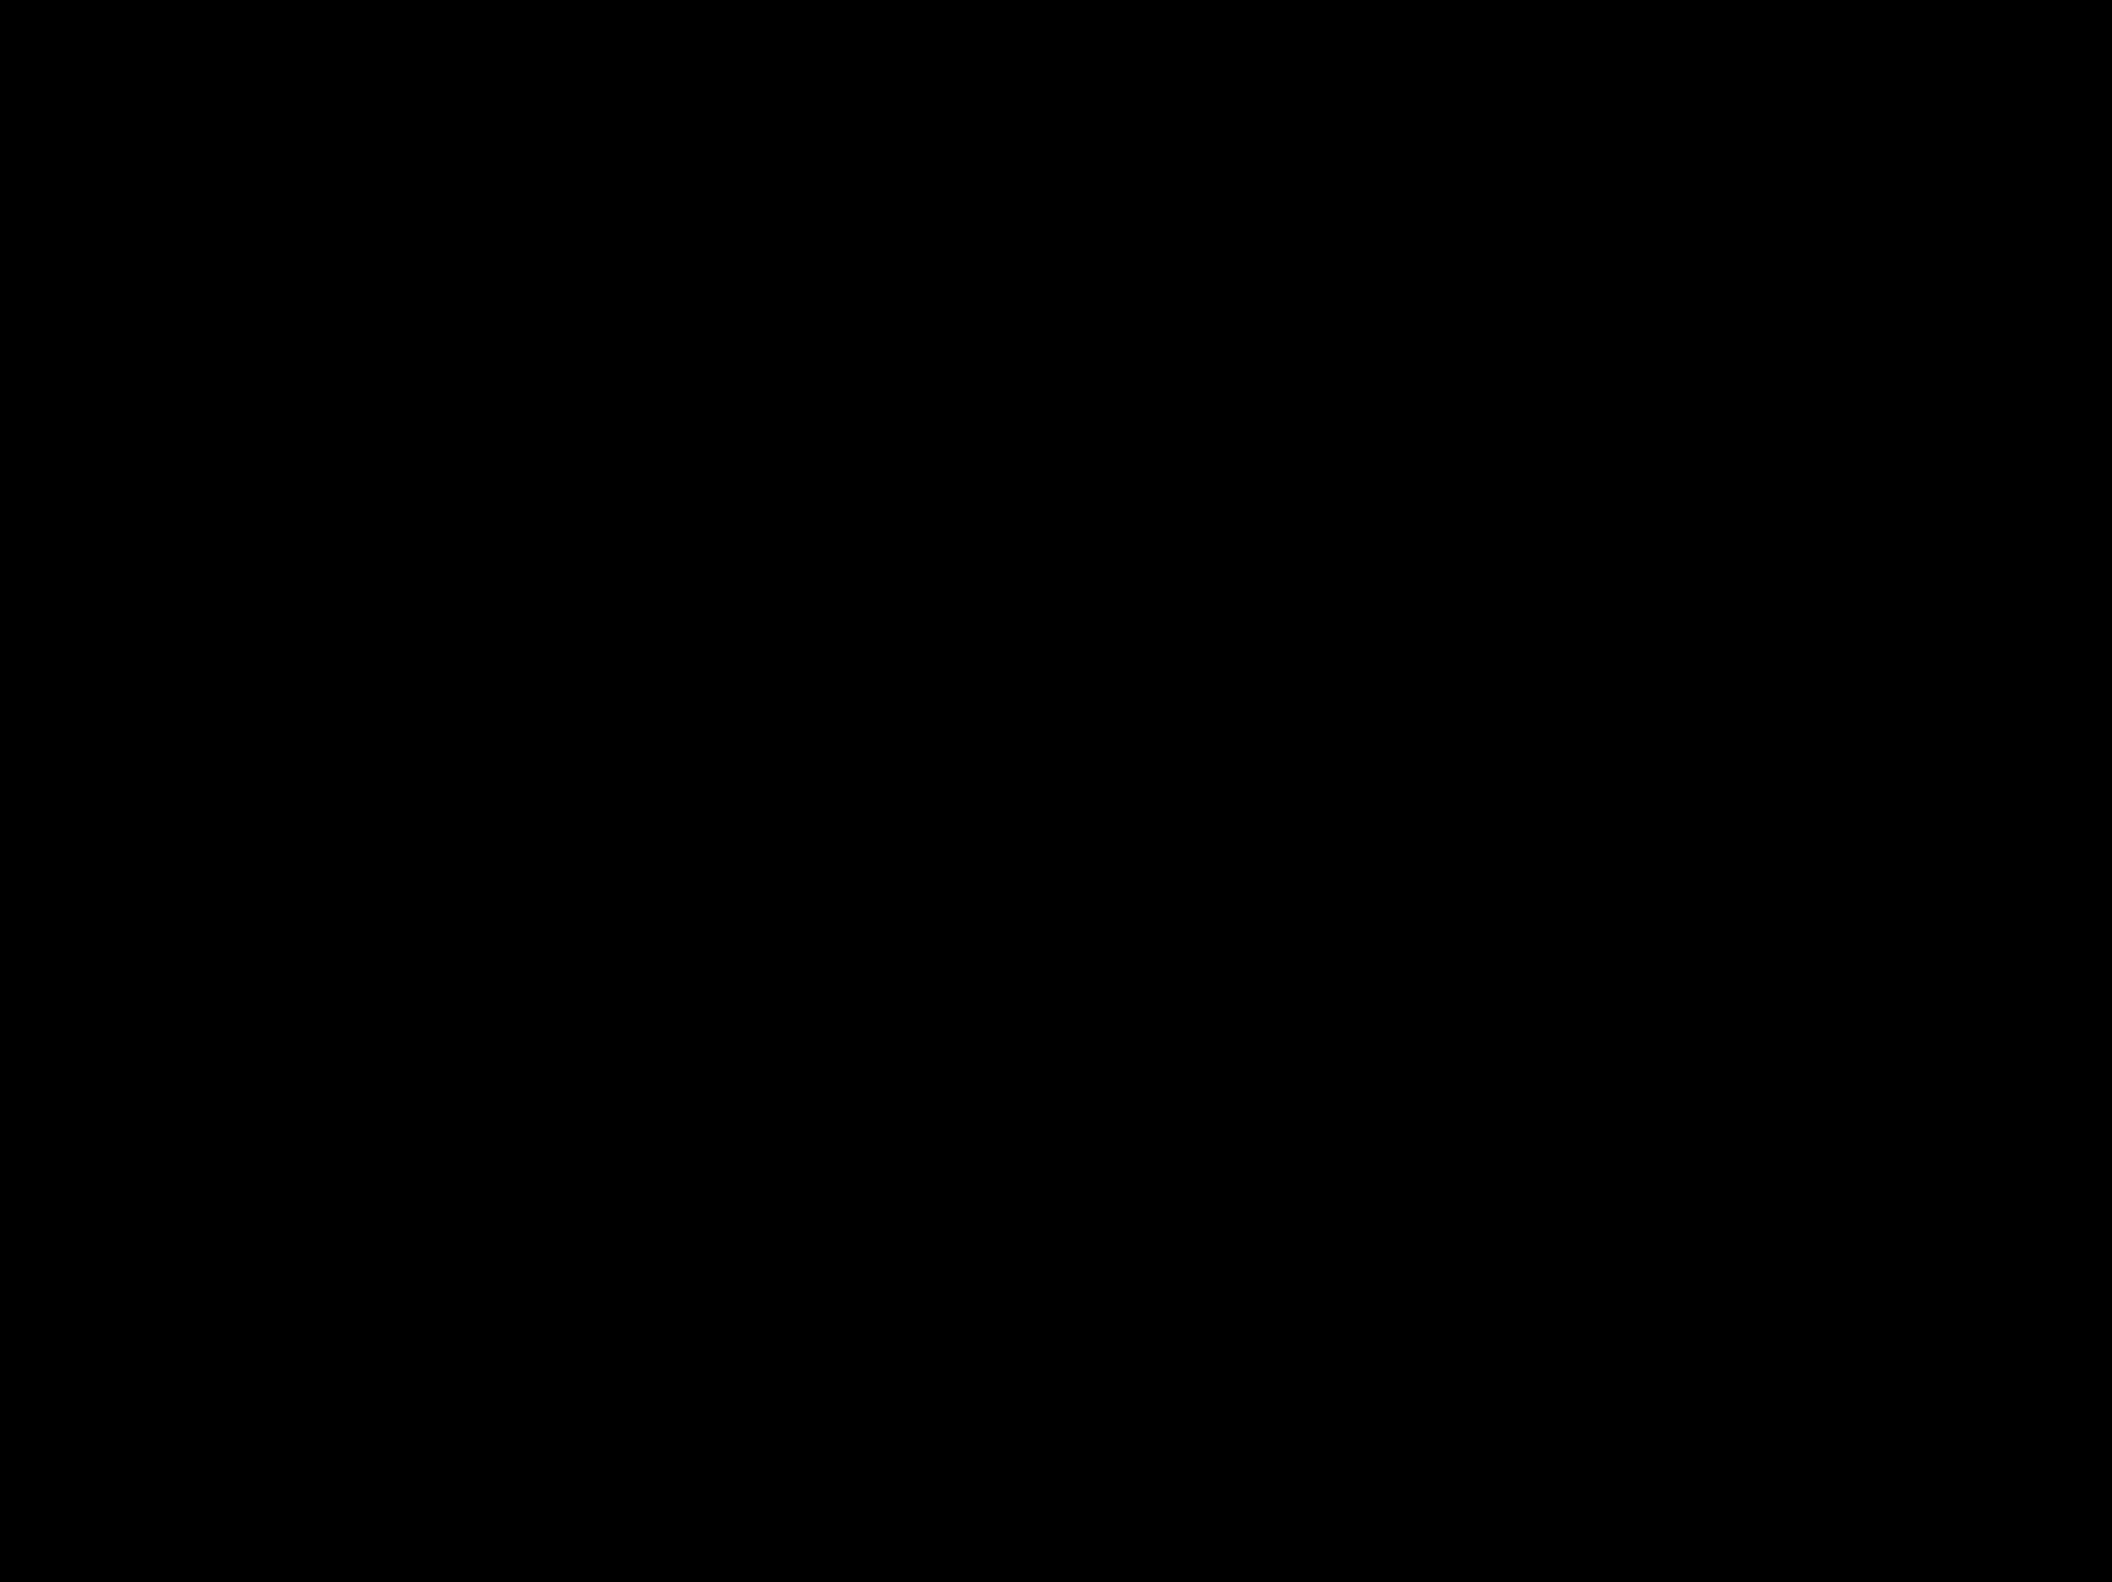 R polypompholyx statistics flowchart public domain geenschuldenfo Choice Image